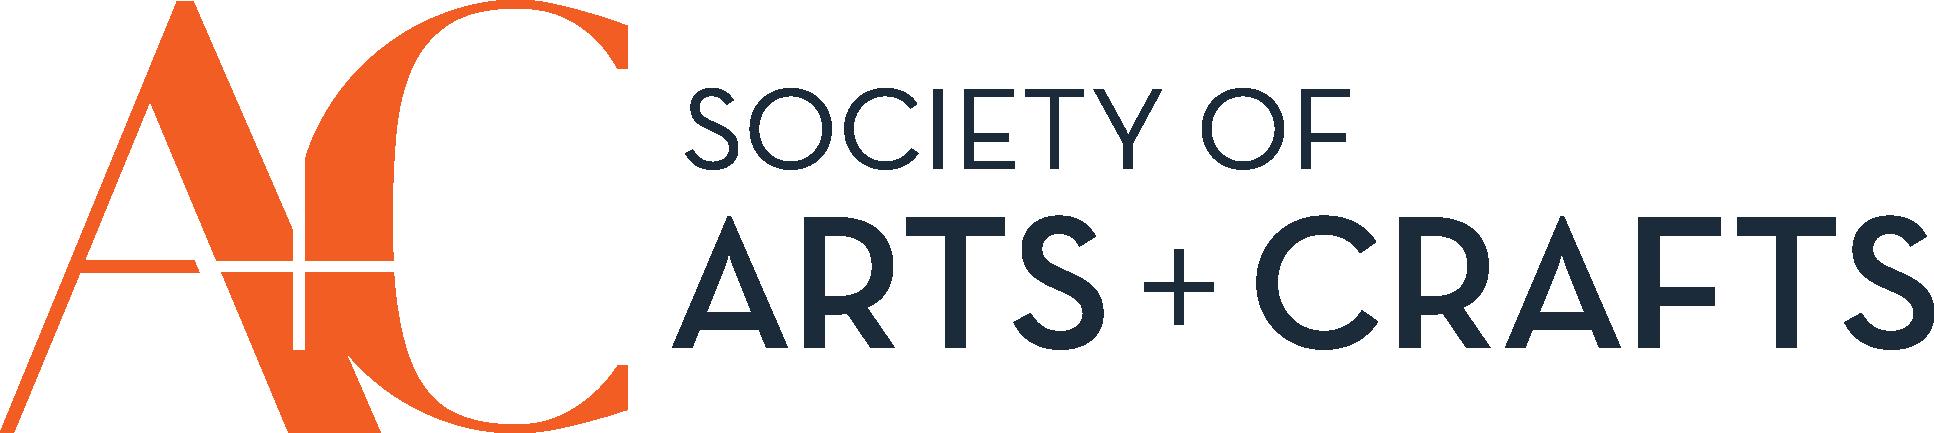 society of arts and crafts logo